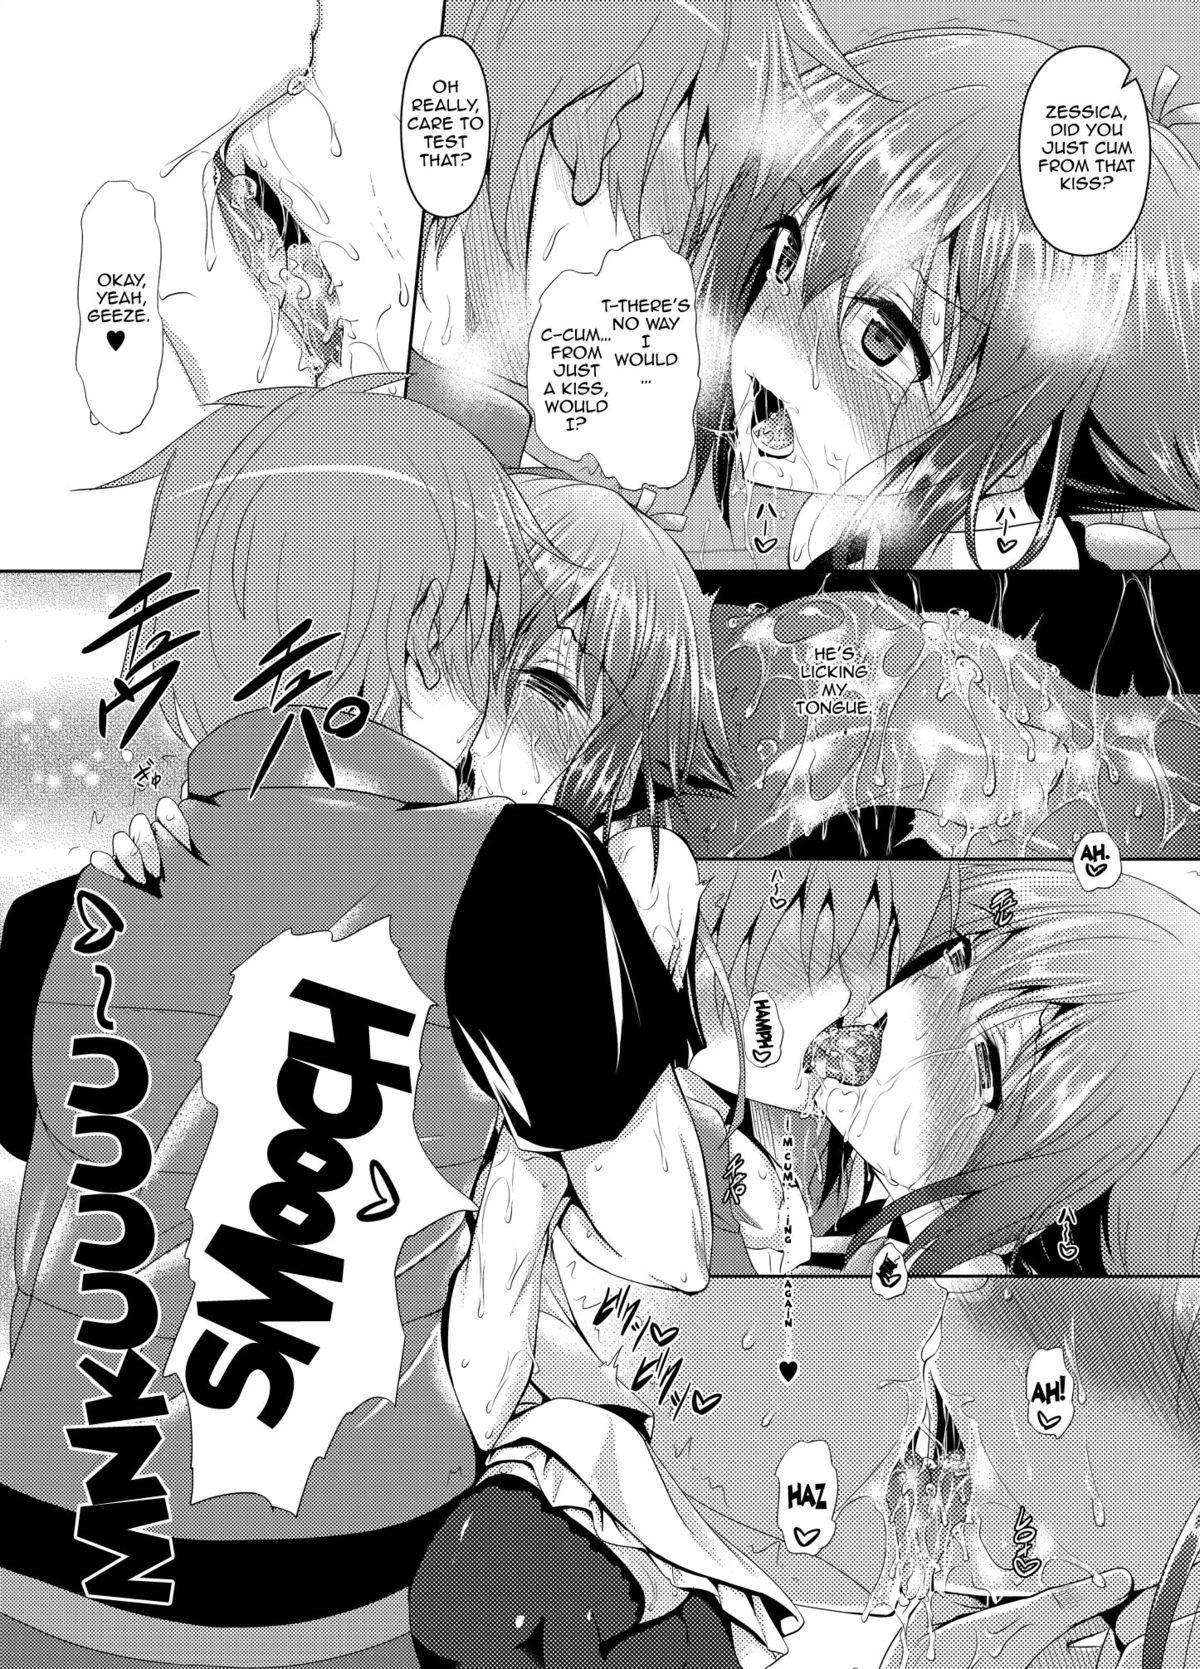 Zessica to Ichaicha Suru dake no Hon   A Book About Flirting with Zessica 6